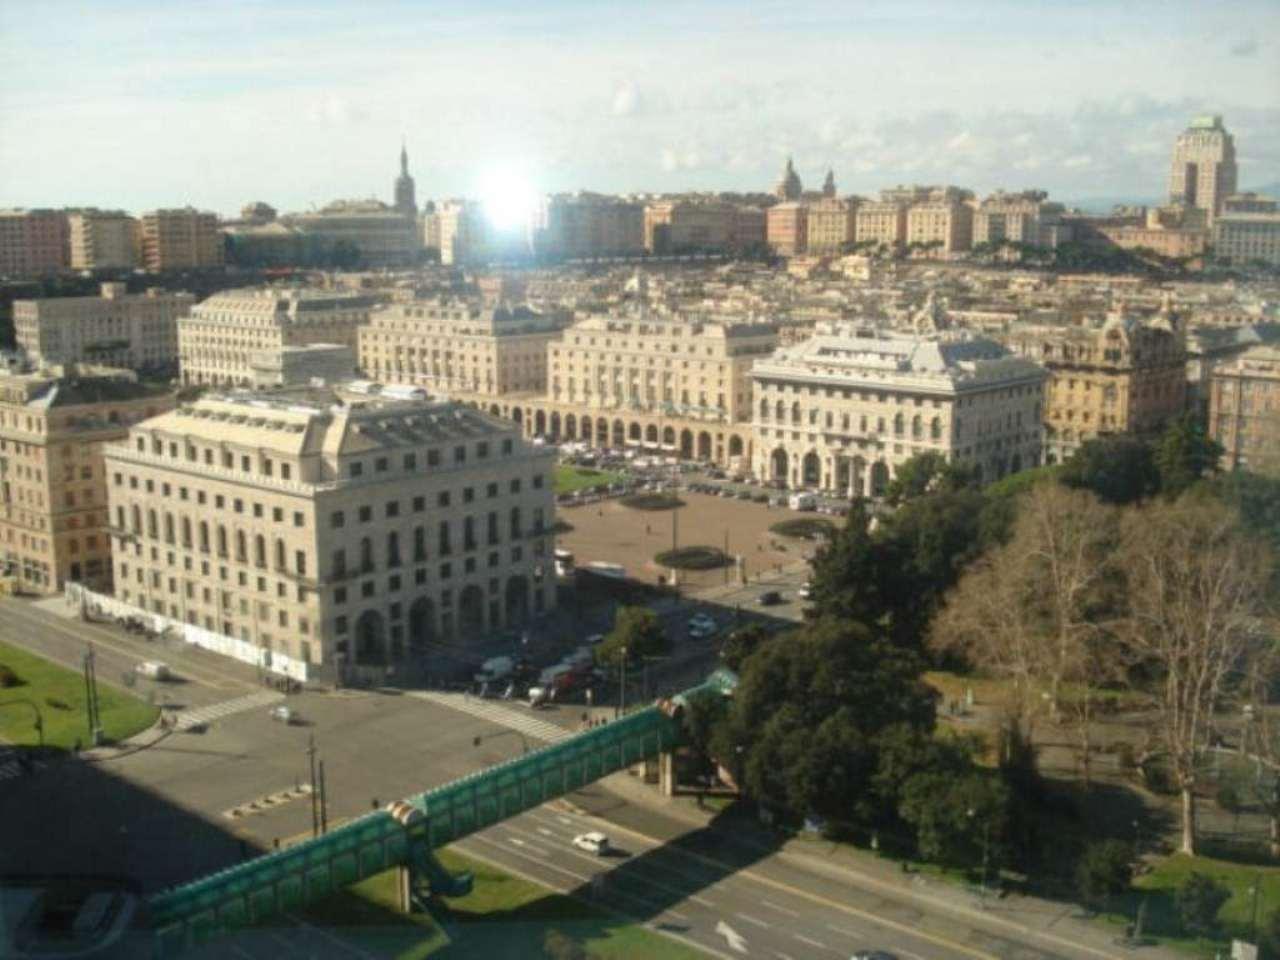 Bilocale Genova Via Duca D'aosta 12